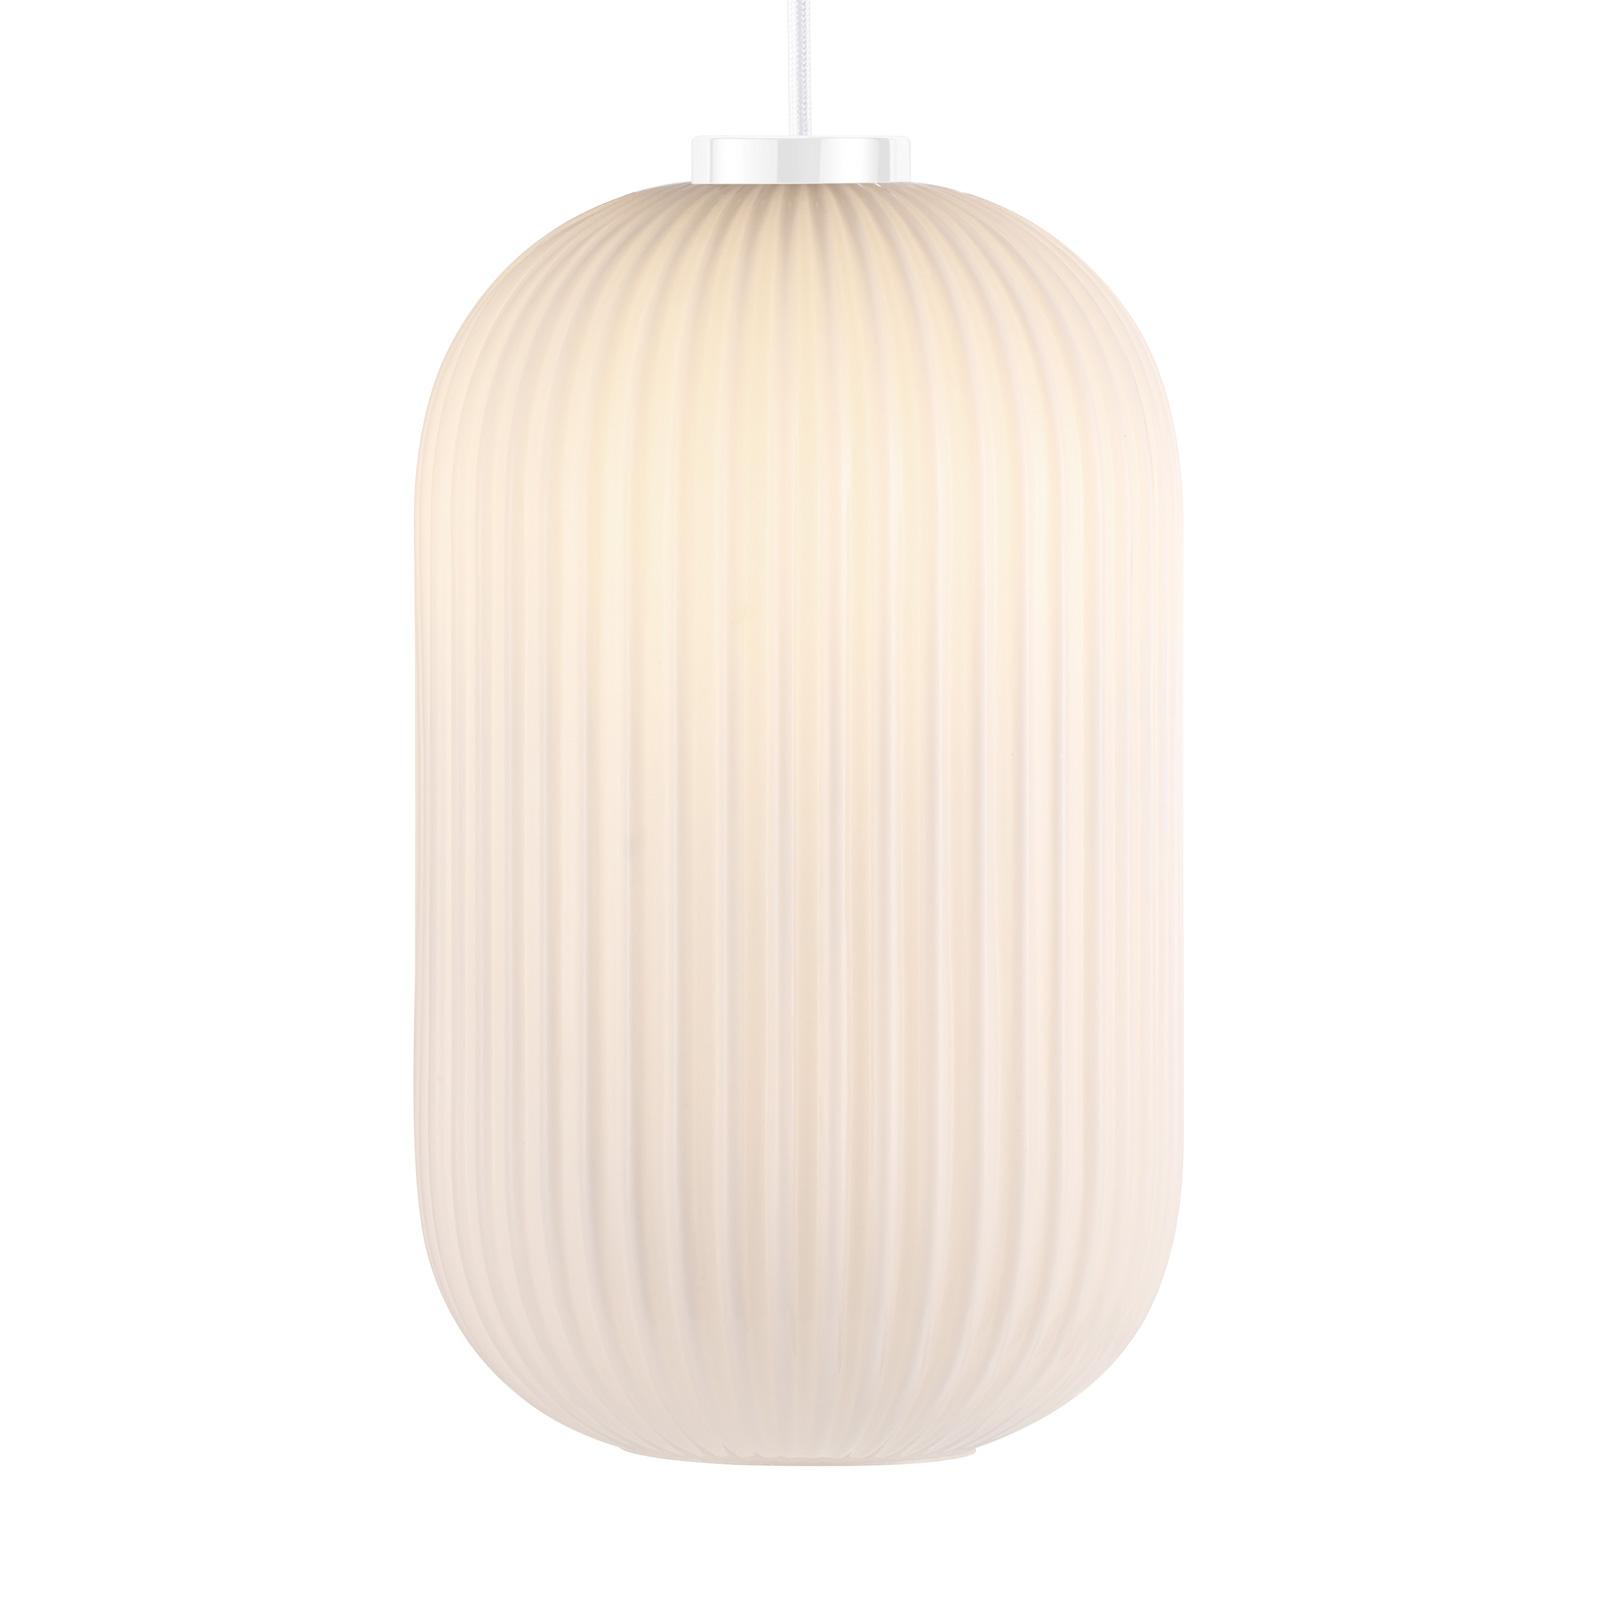 Hanglamp Milford 20 met gegroefde glazen kap